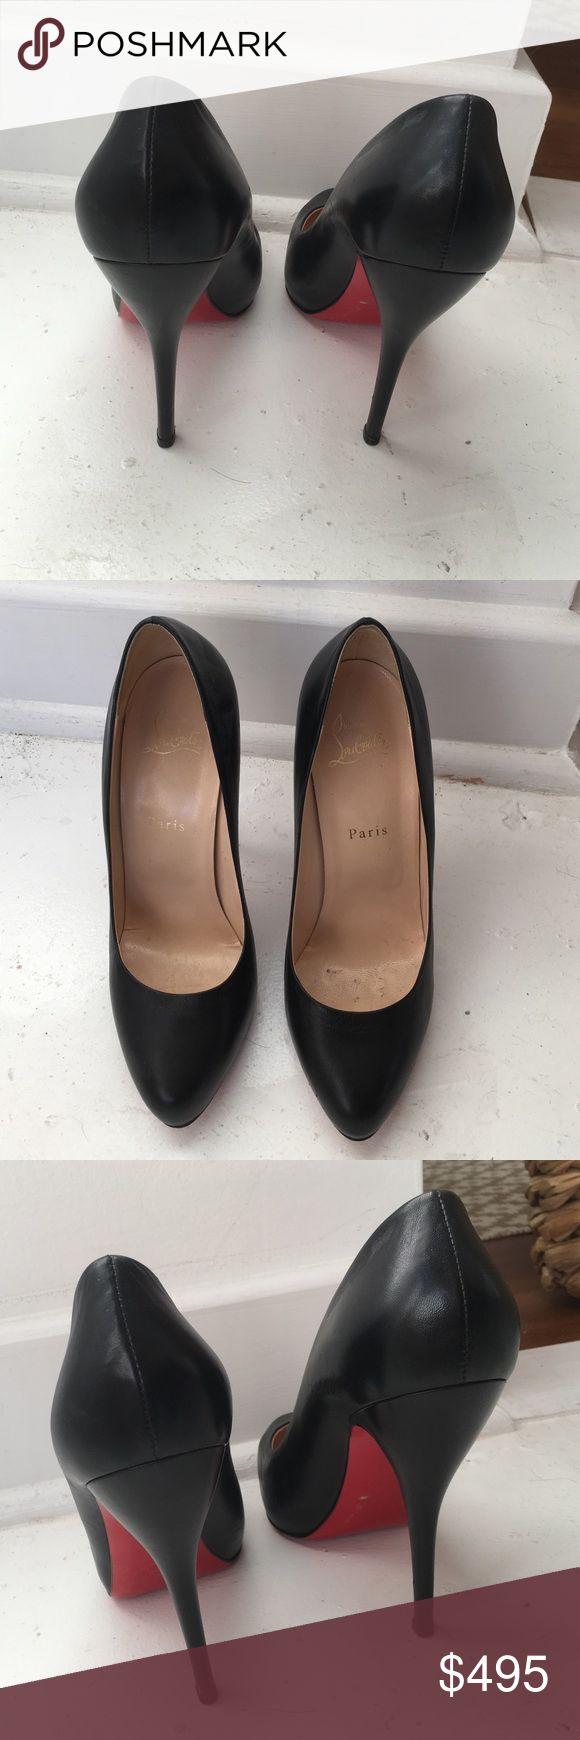 Christian Louboutin black pump Lightly used Louboutin Black Pumps! Worn 3 times! Christian Louboutin Shoes Heels